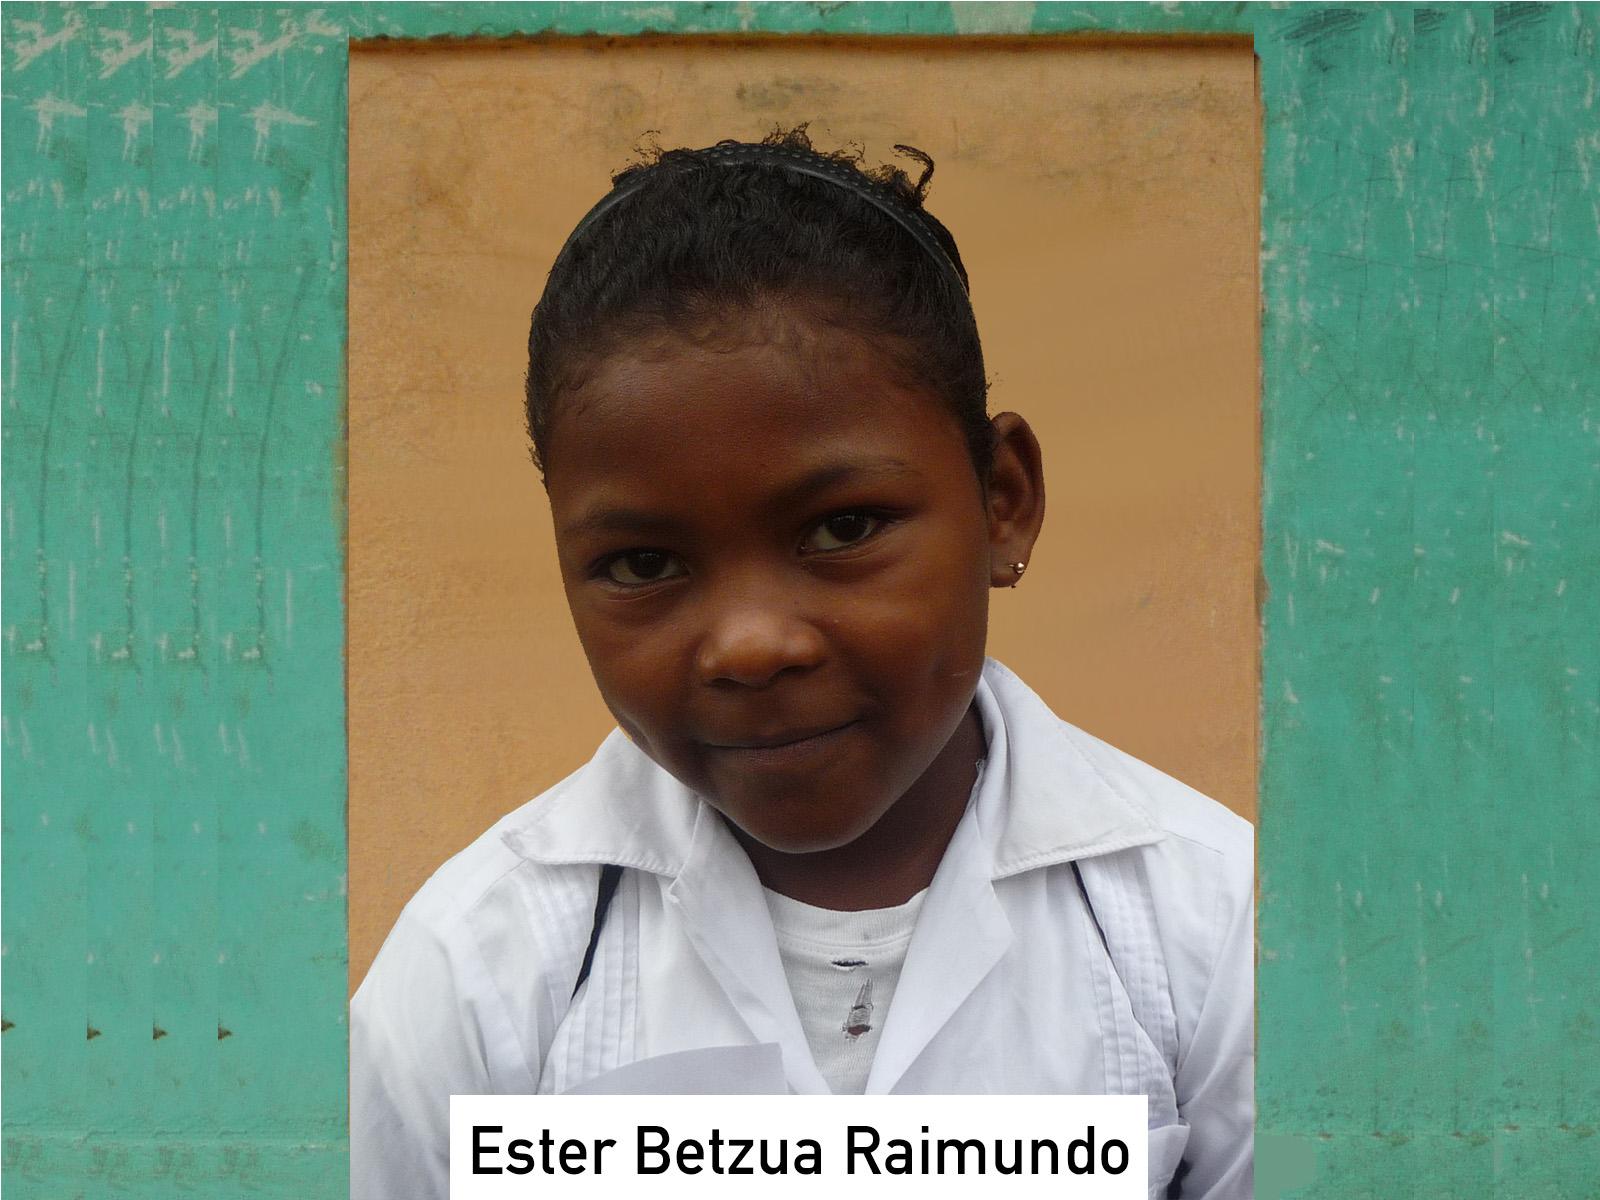 027 - Ester Betzua Raimundo.jpg